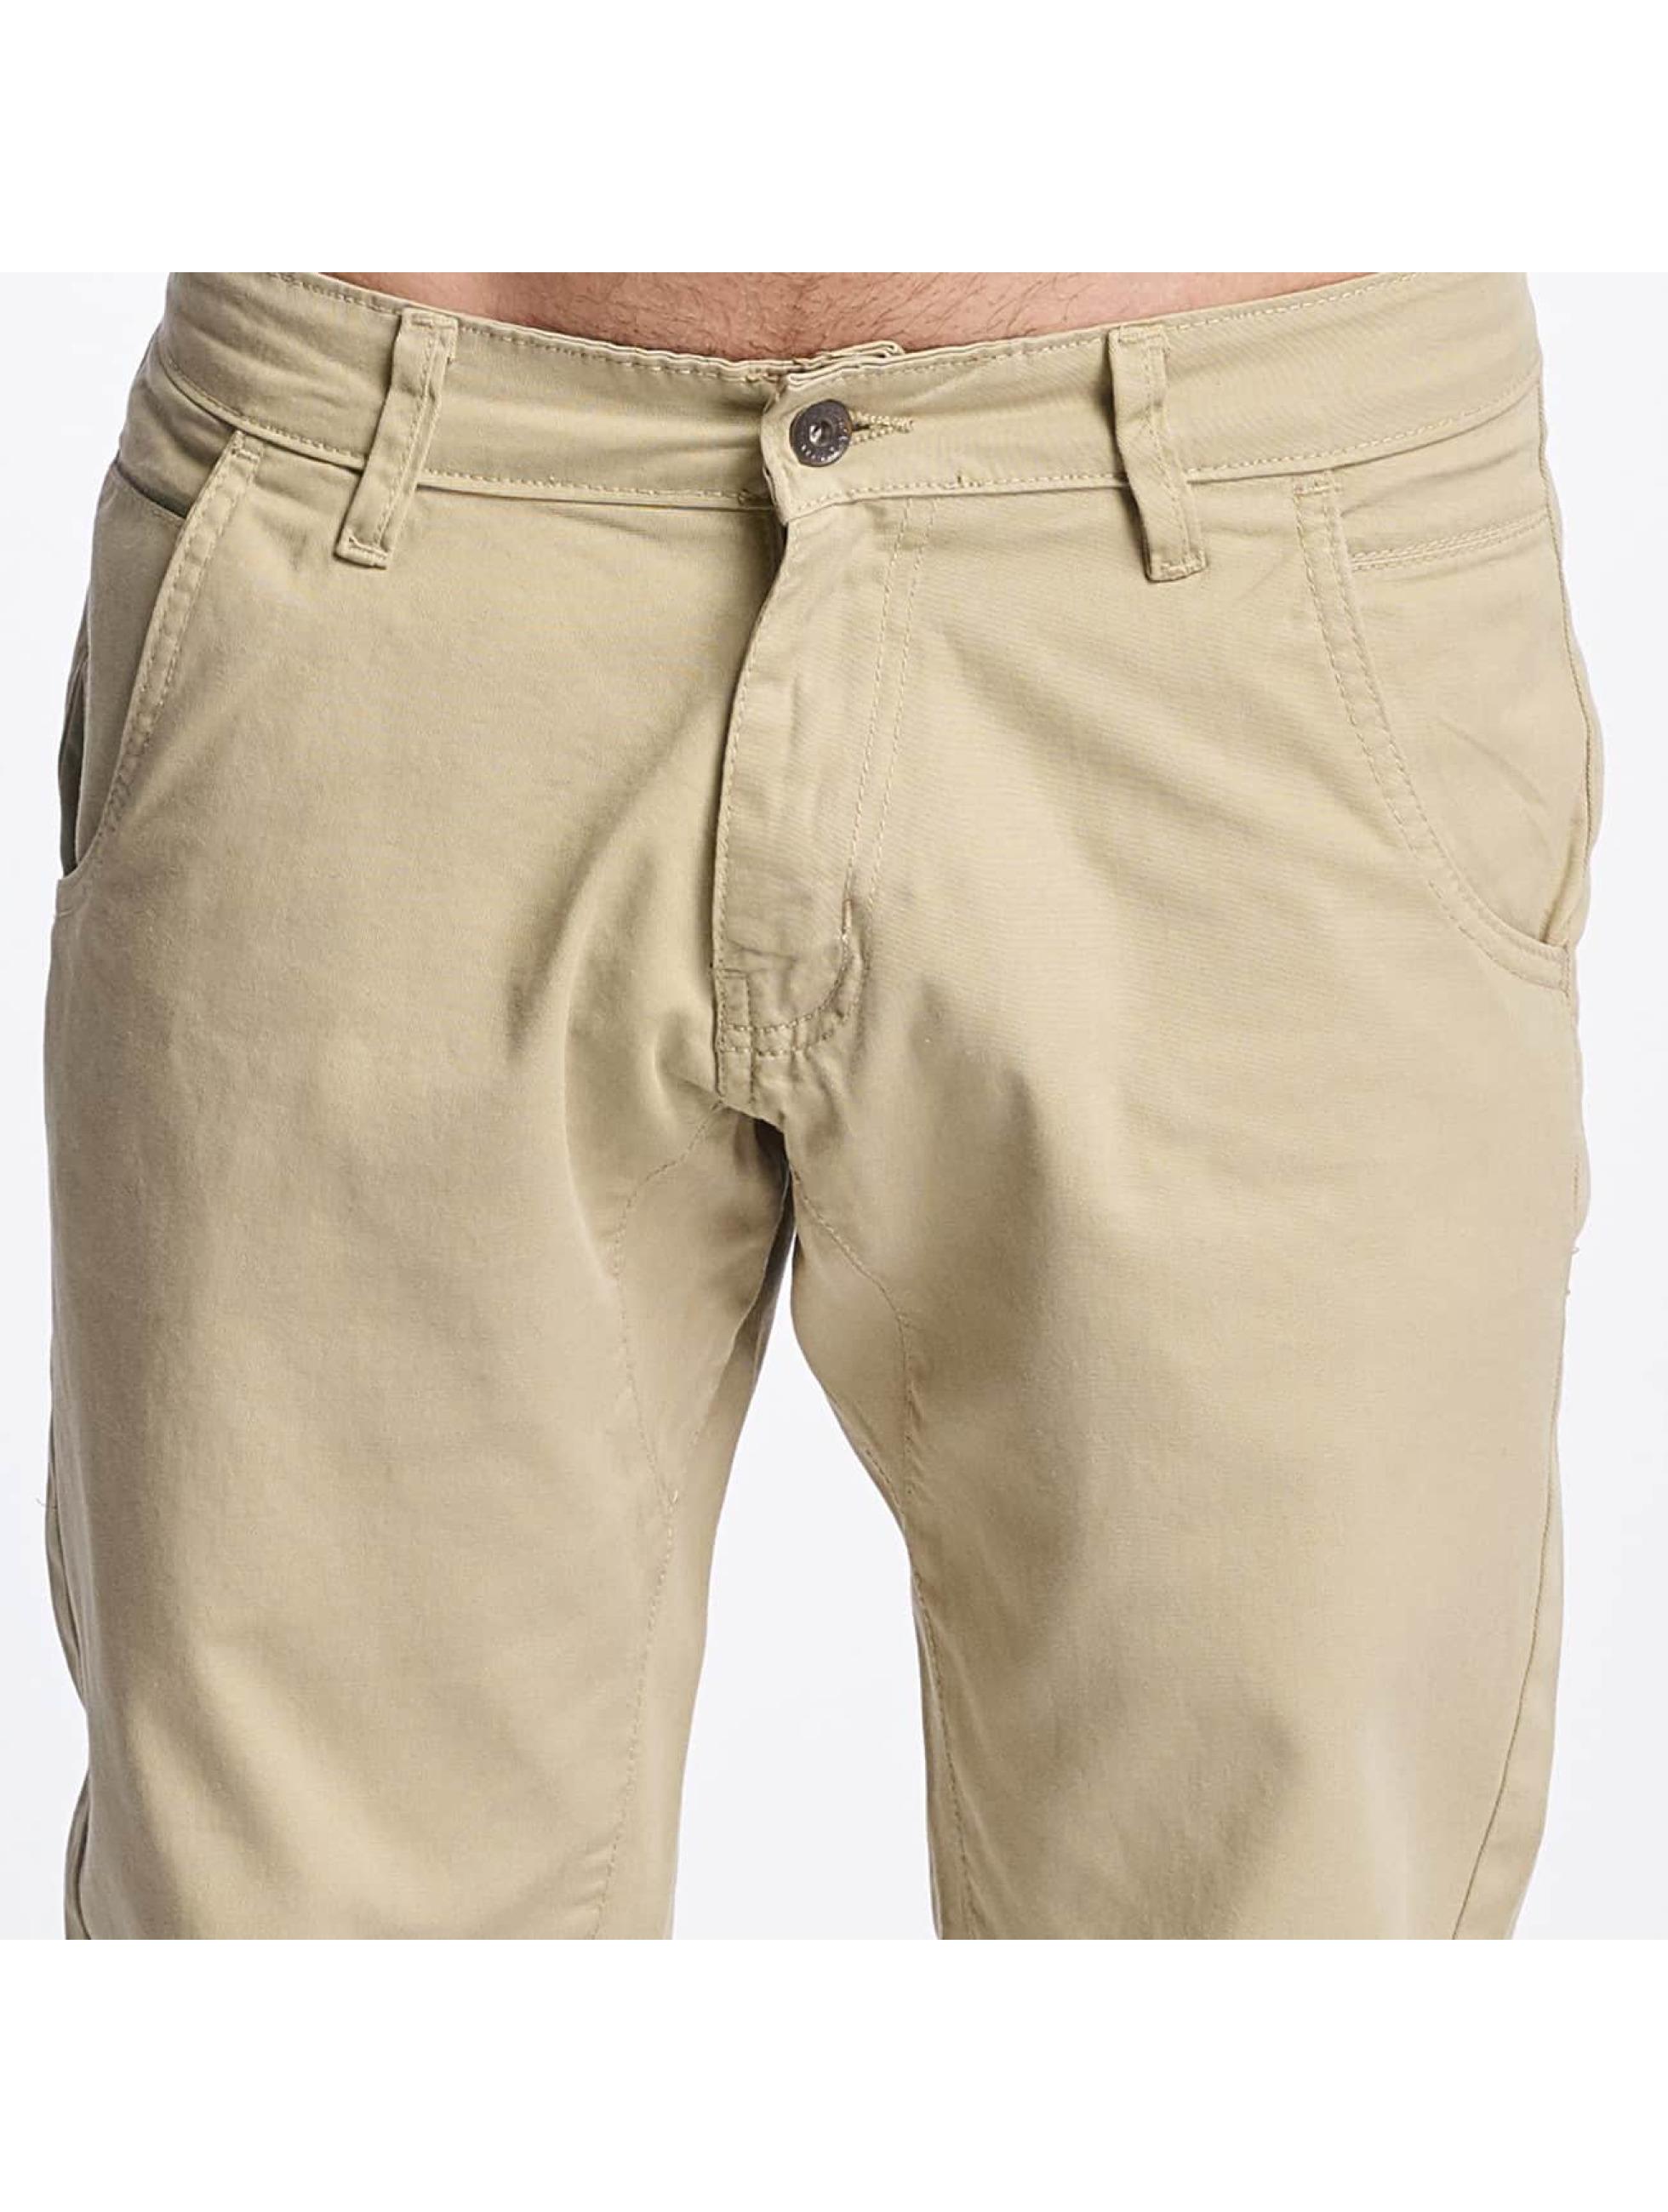 Rocawear Chino pants Jogger khaki